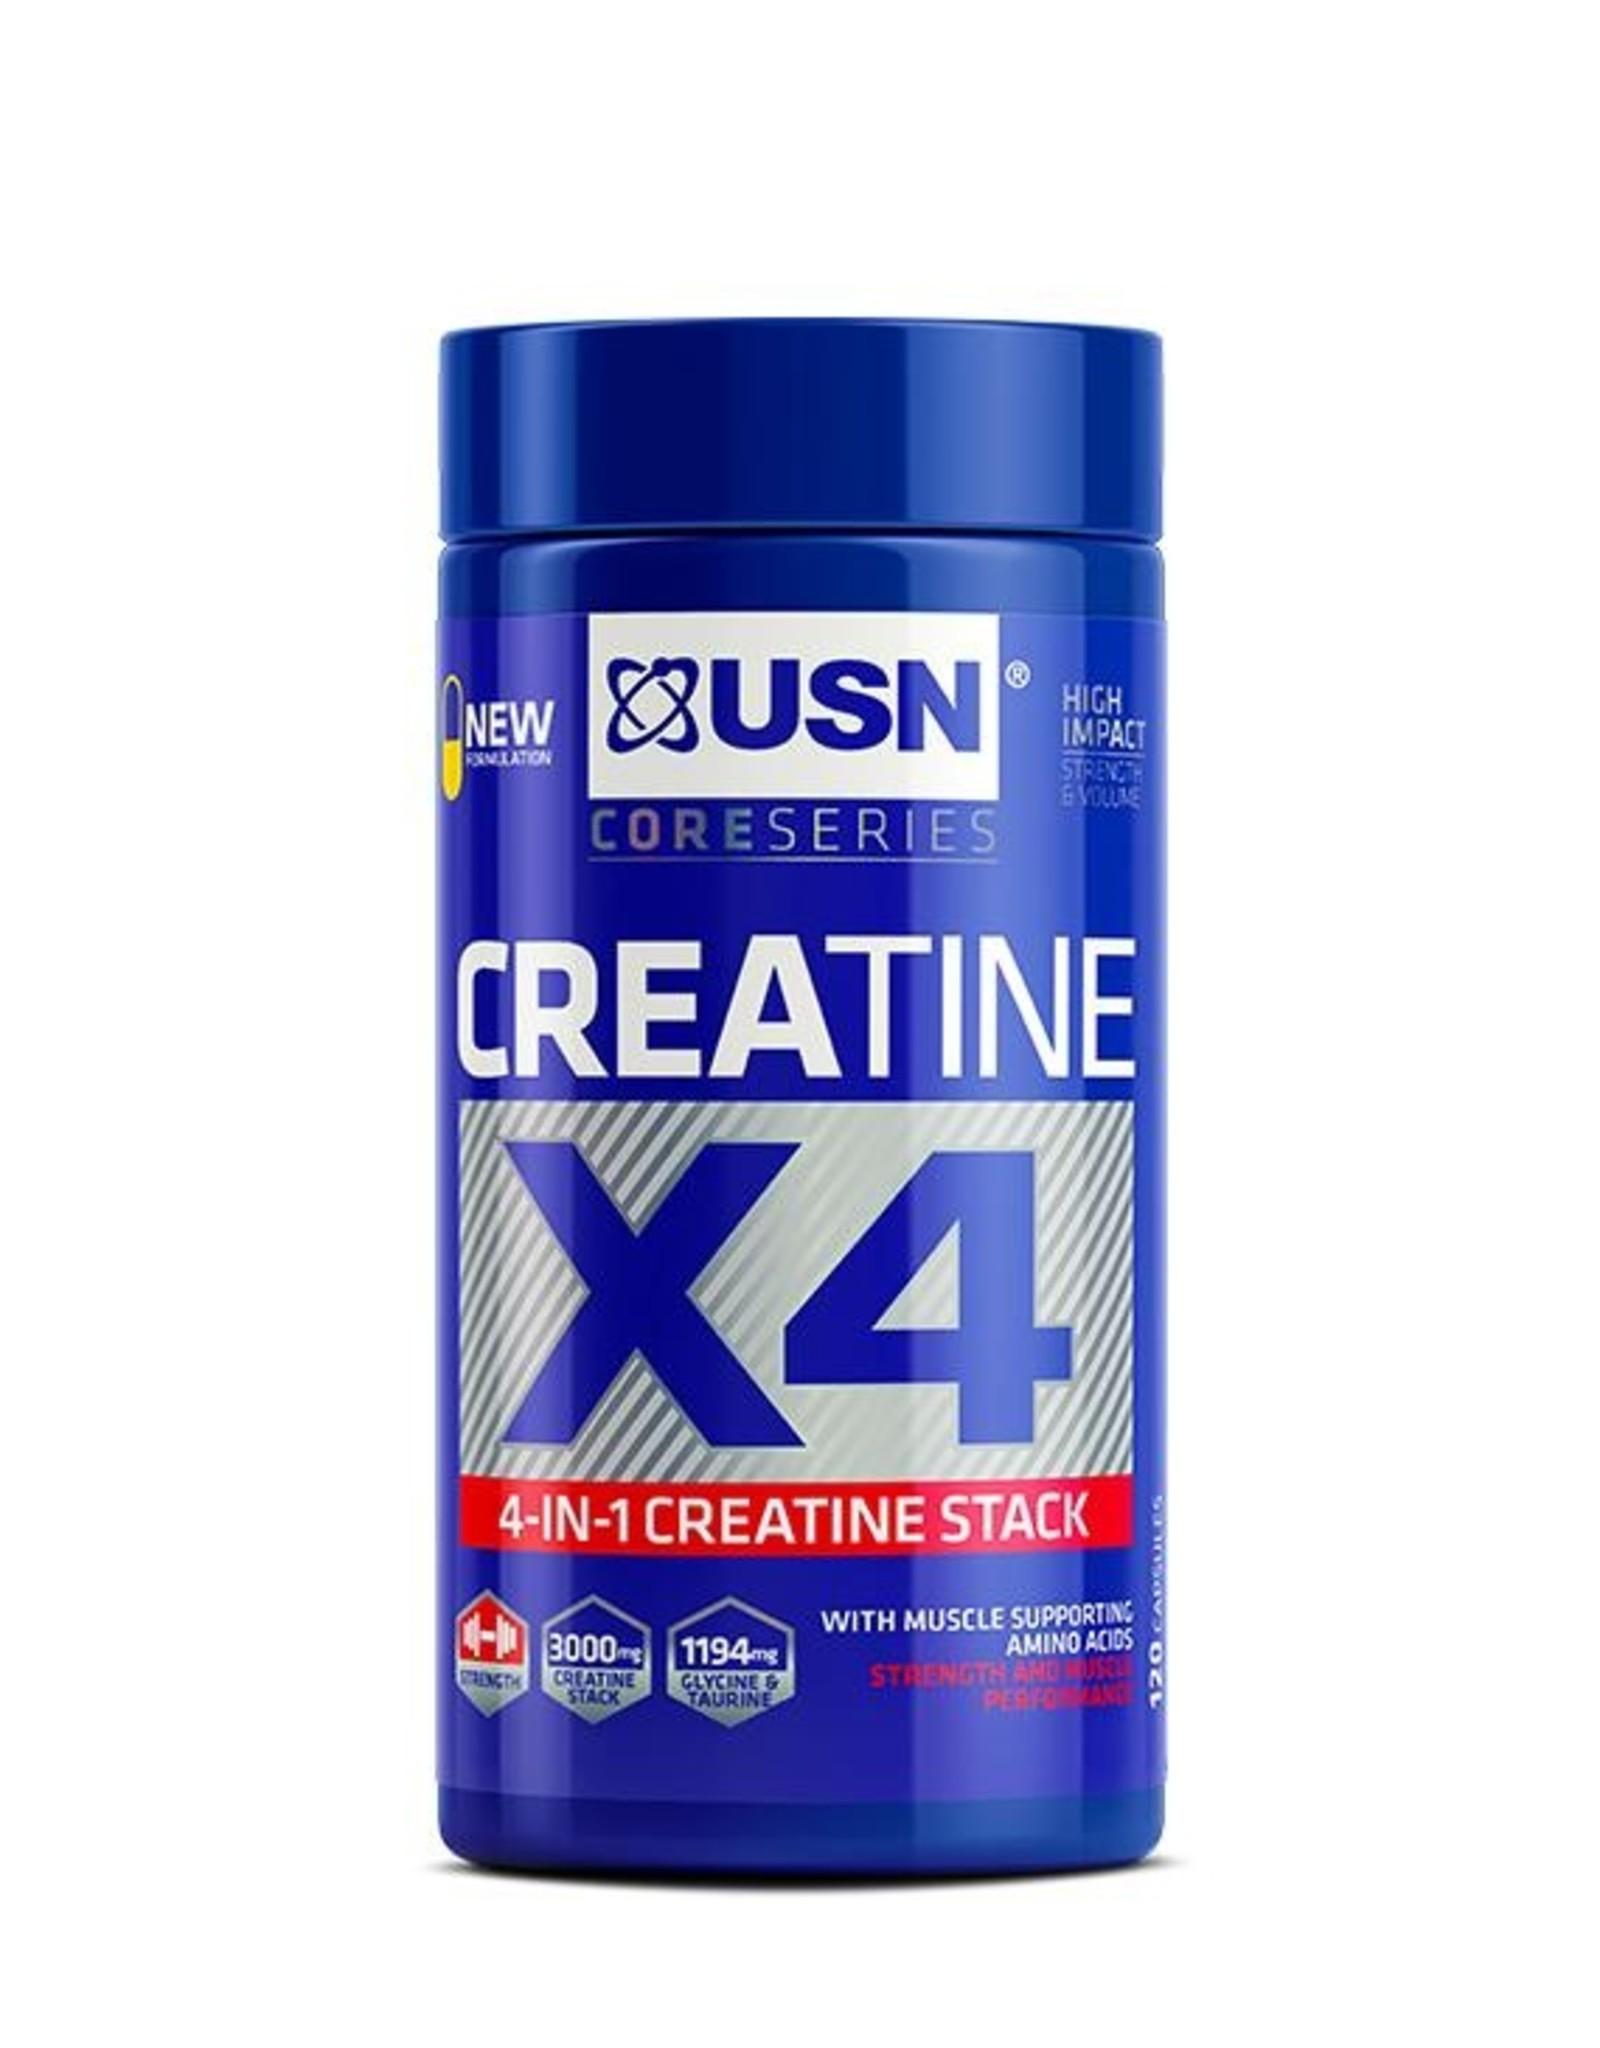 USN USN CREATINE X4 capsules